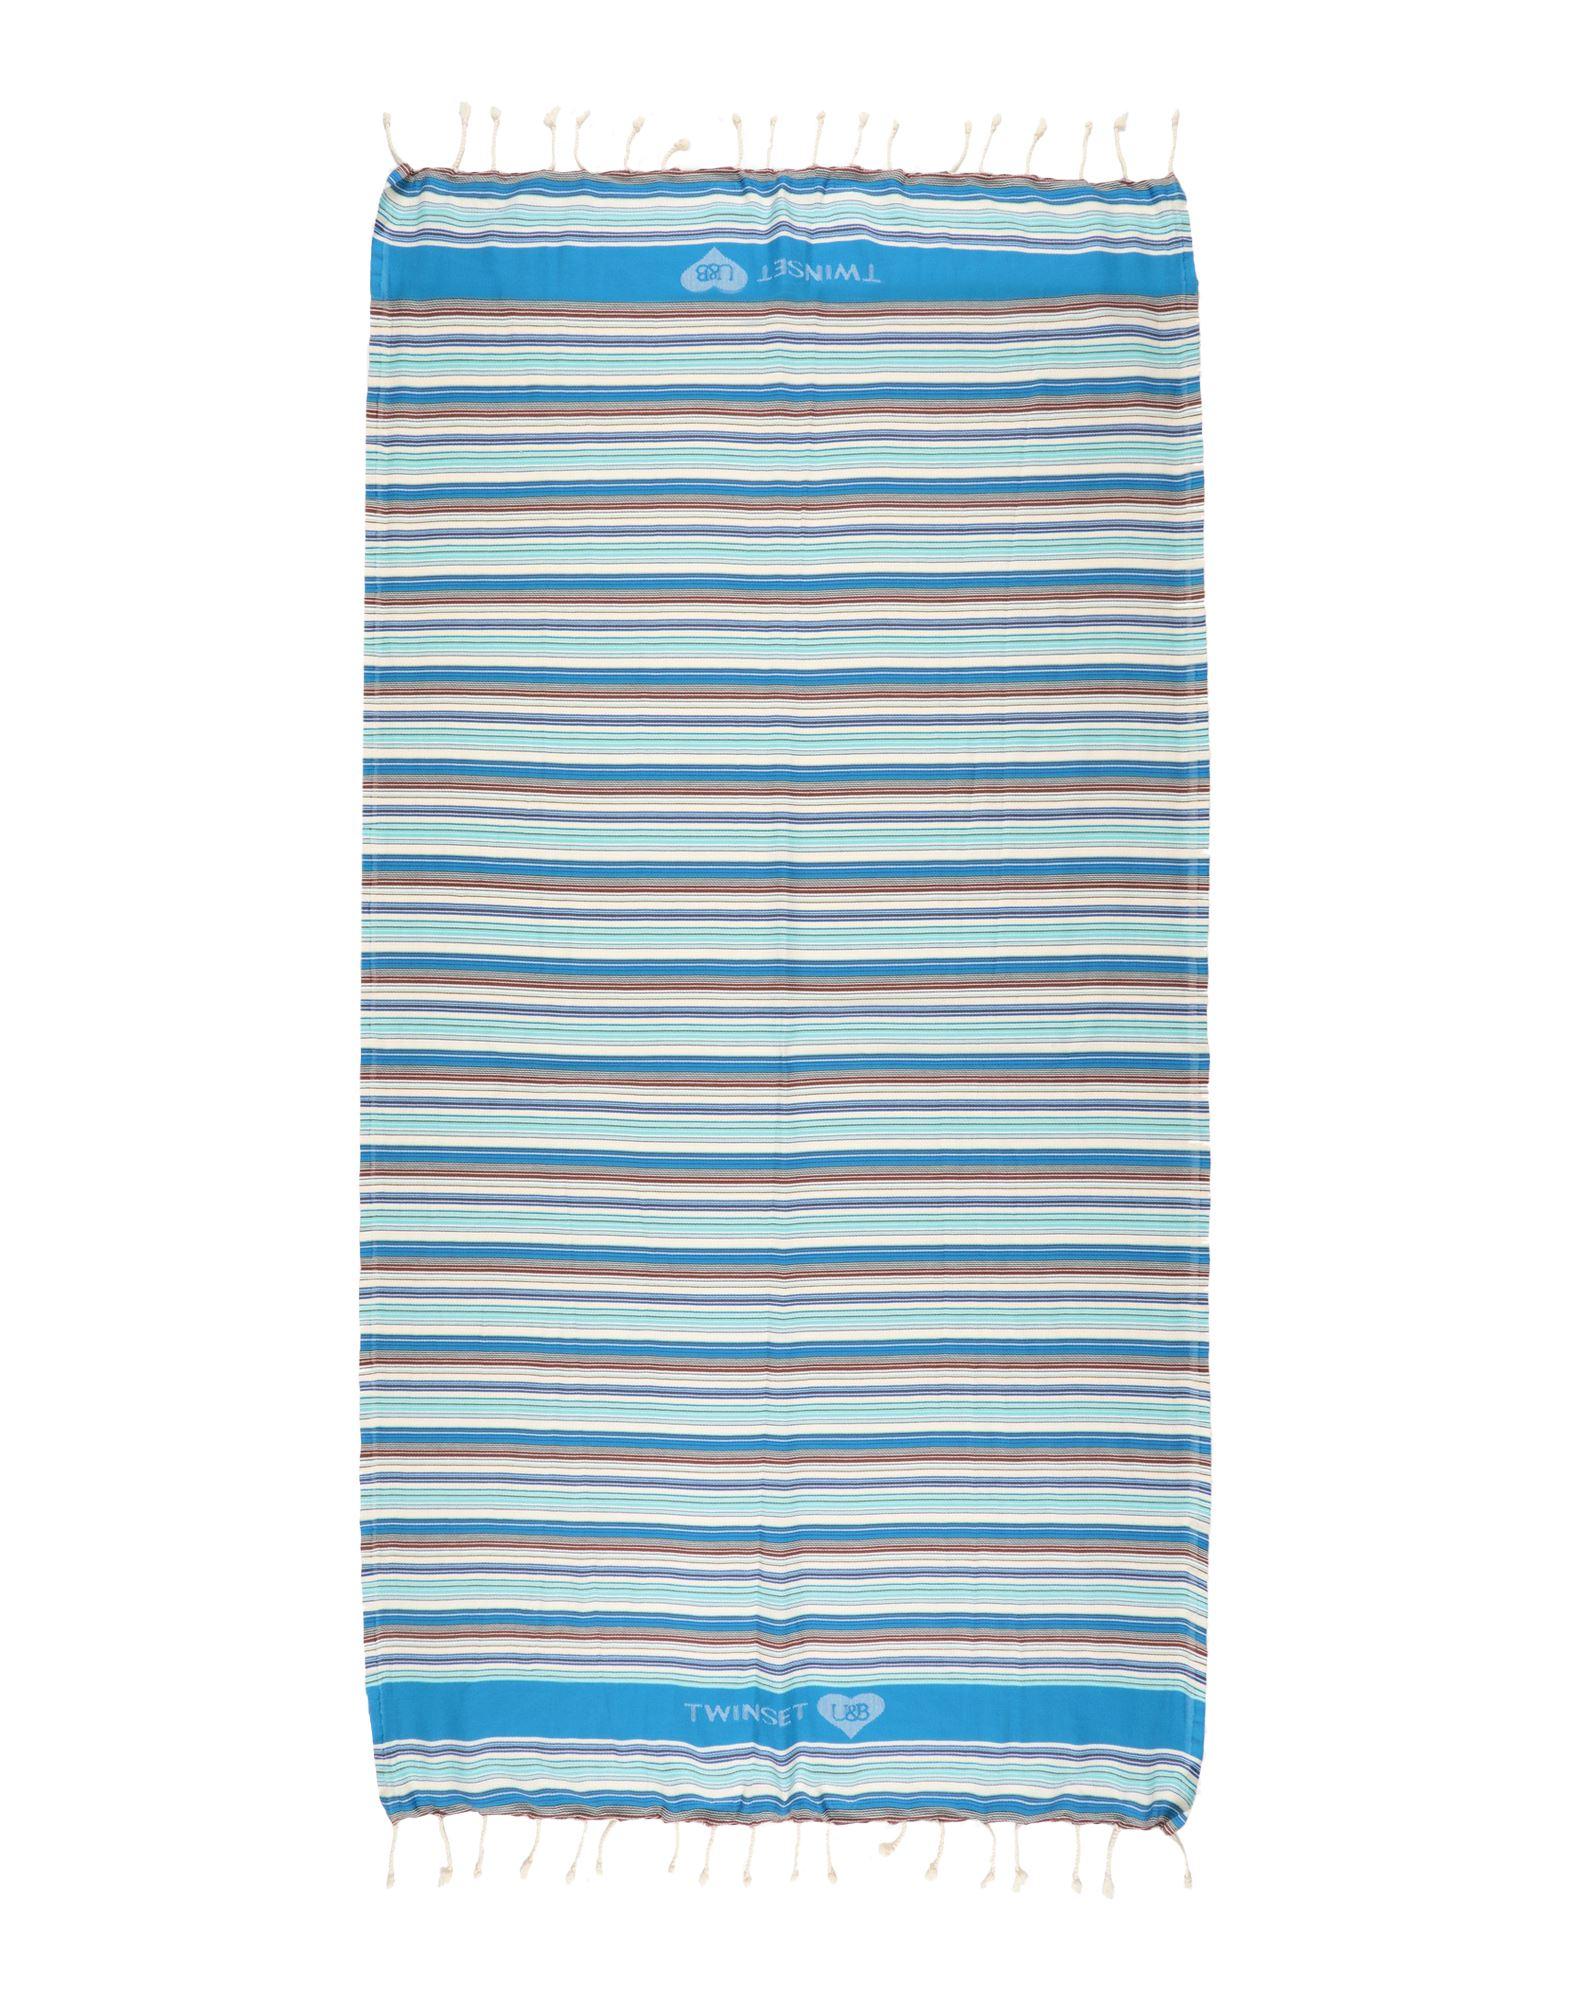 TWINSET Пляжное полотенце пляжное полотенце в сумке soaking красное